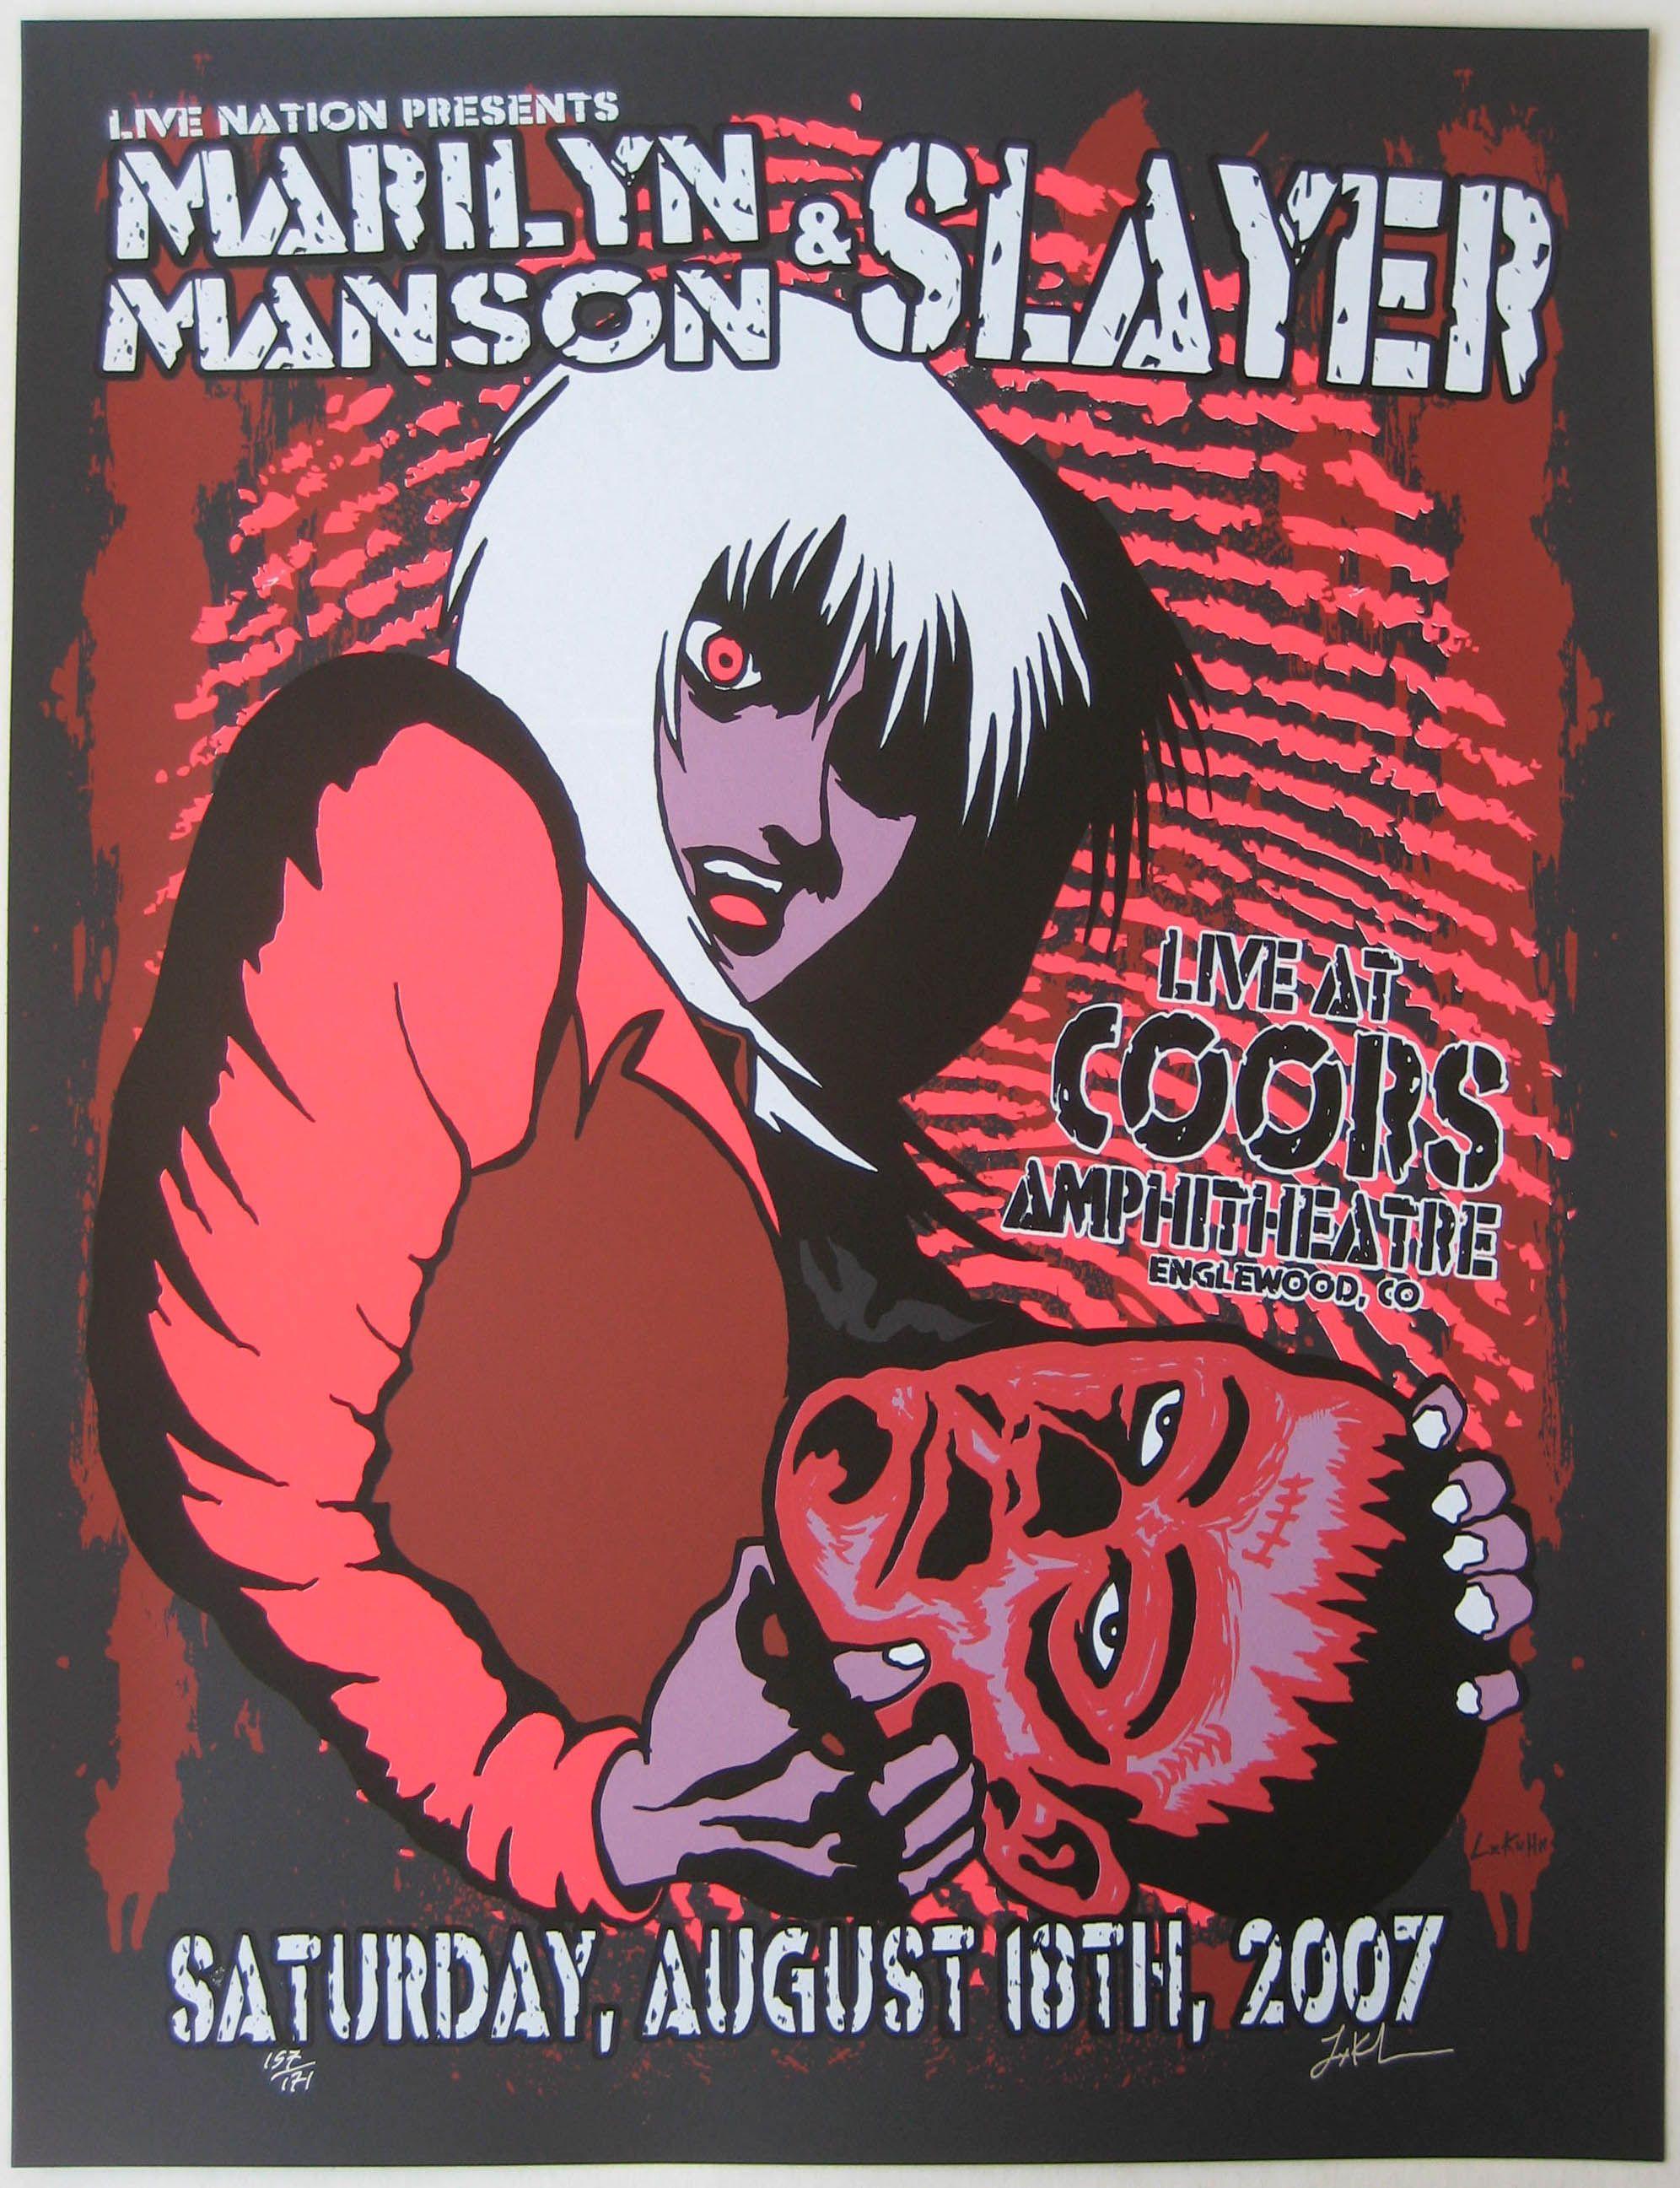 Marilyn Manson Poster W Slayer 2007 Concert In 2020 Concert Posters Manson Marilyn Manson